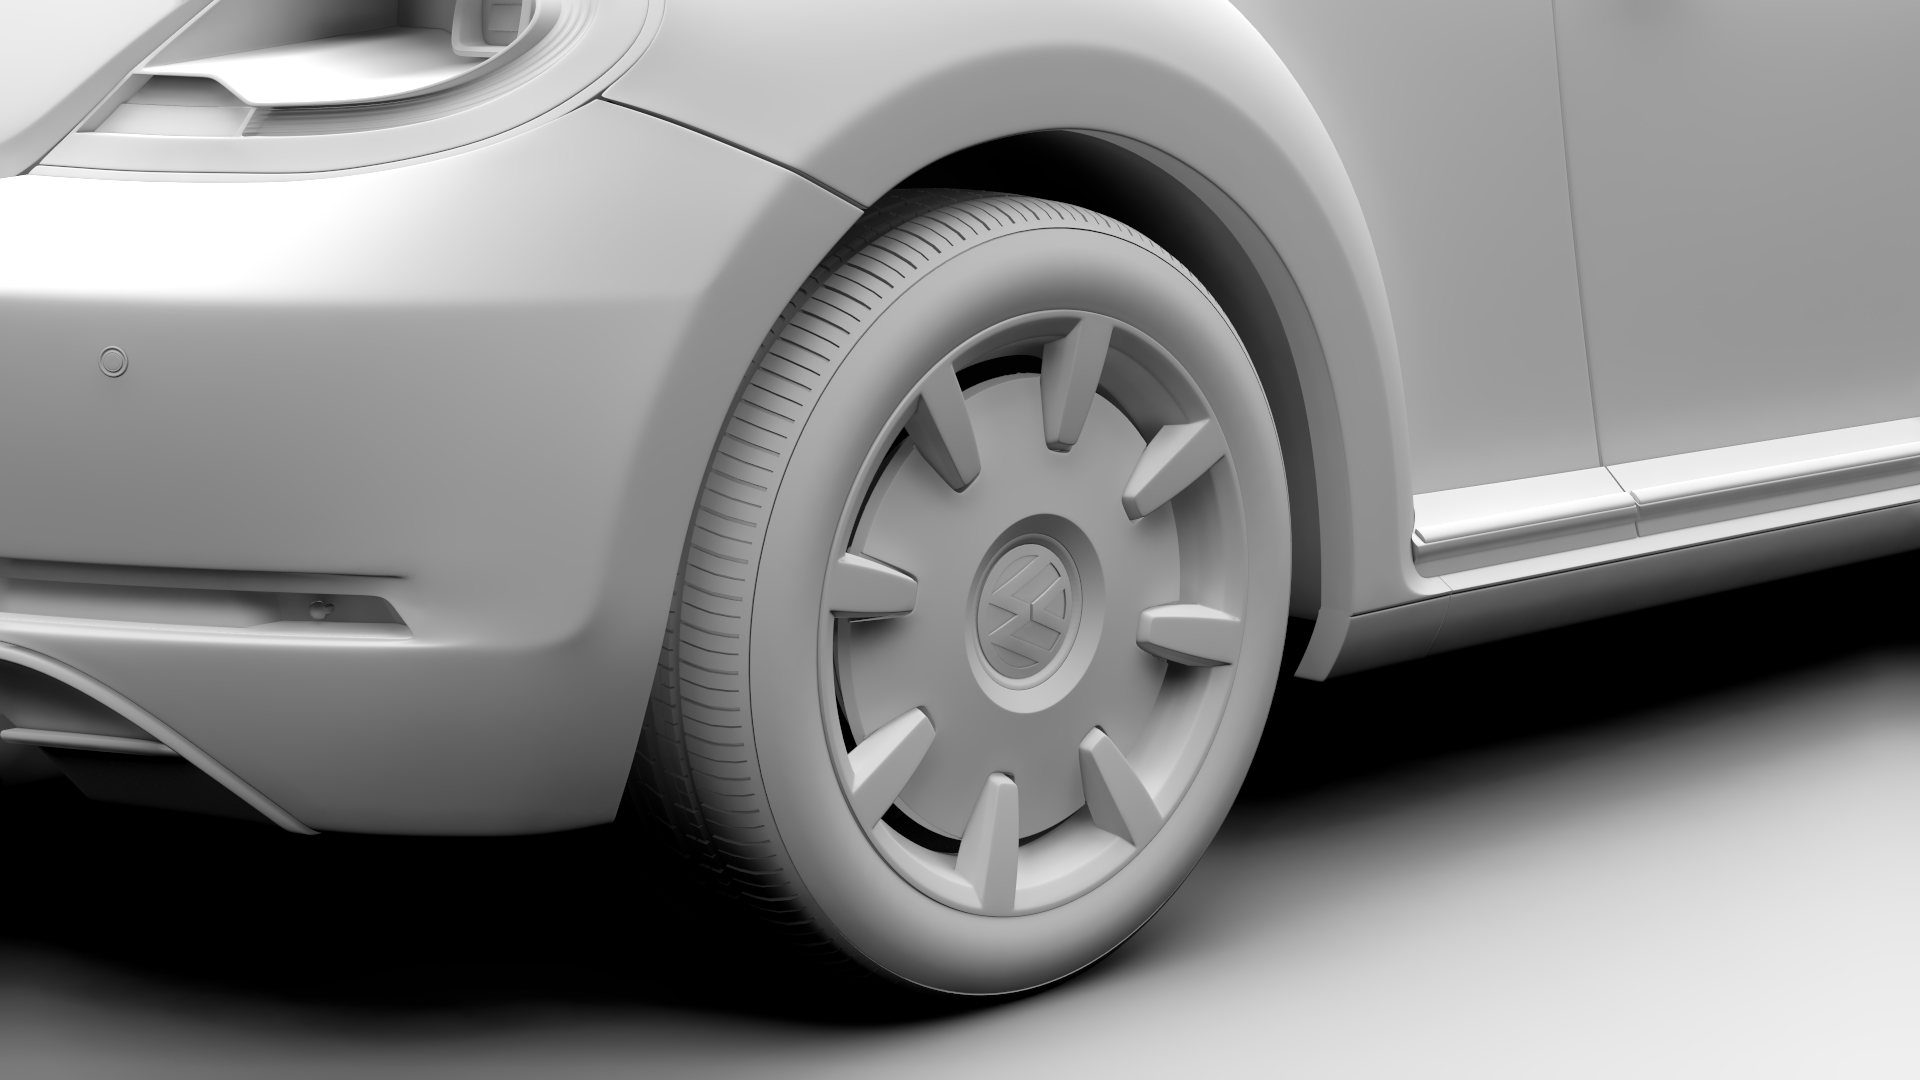 vw beetle turbo 2017 3d model 3ds max fbx c4d lwo ma mb hrc xsi obj 221669